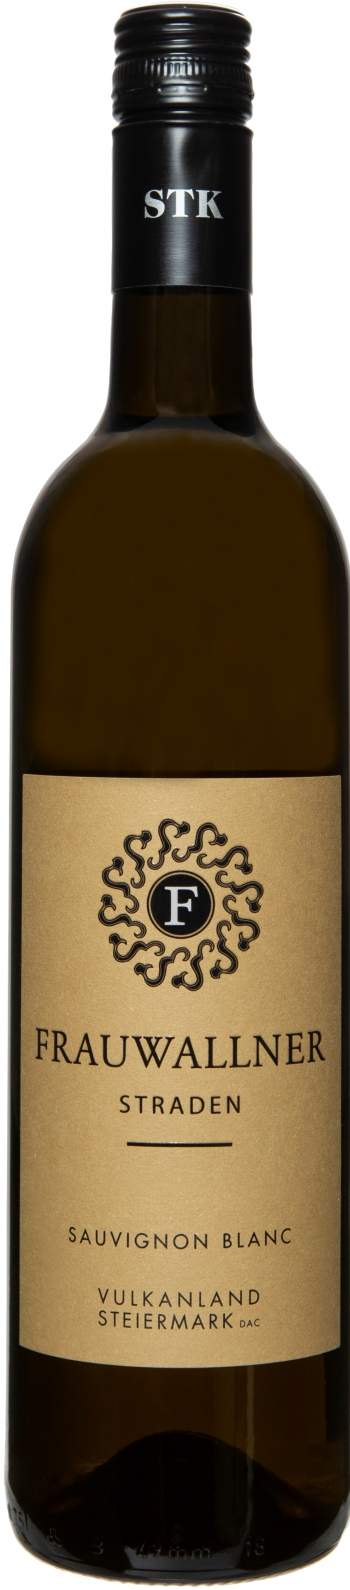 Sauvignon Blanc Vulkanland DAC, Frauwallner 2020